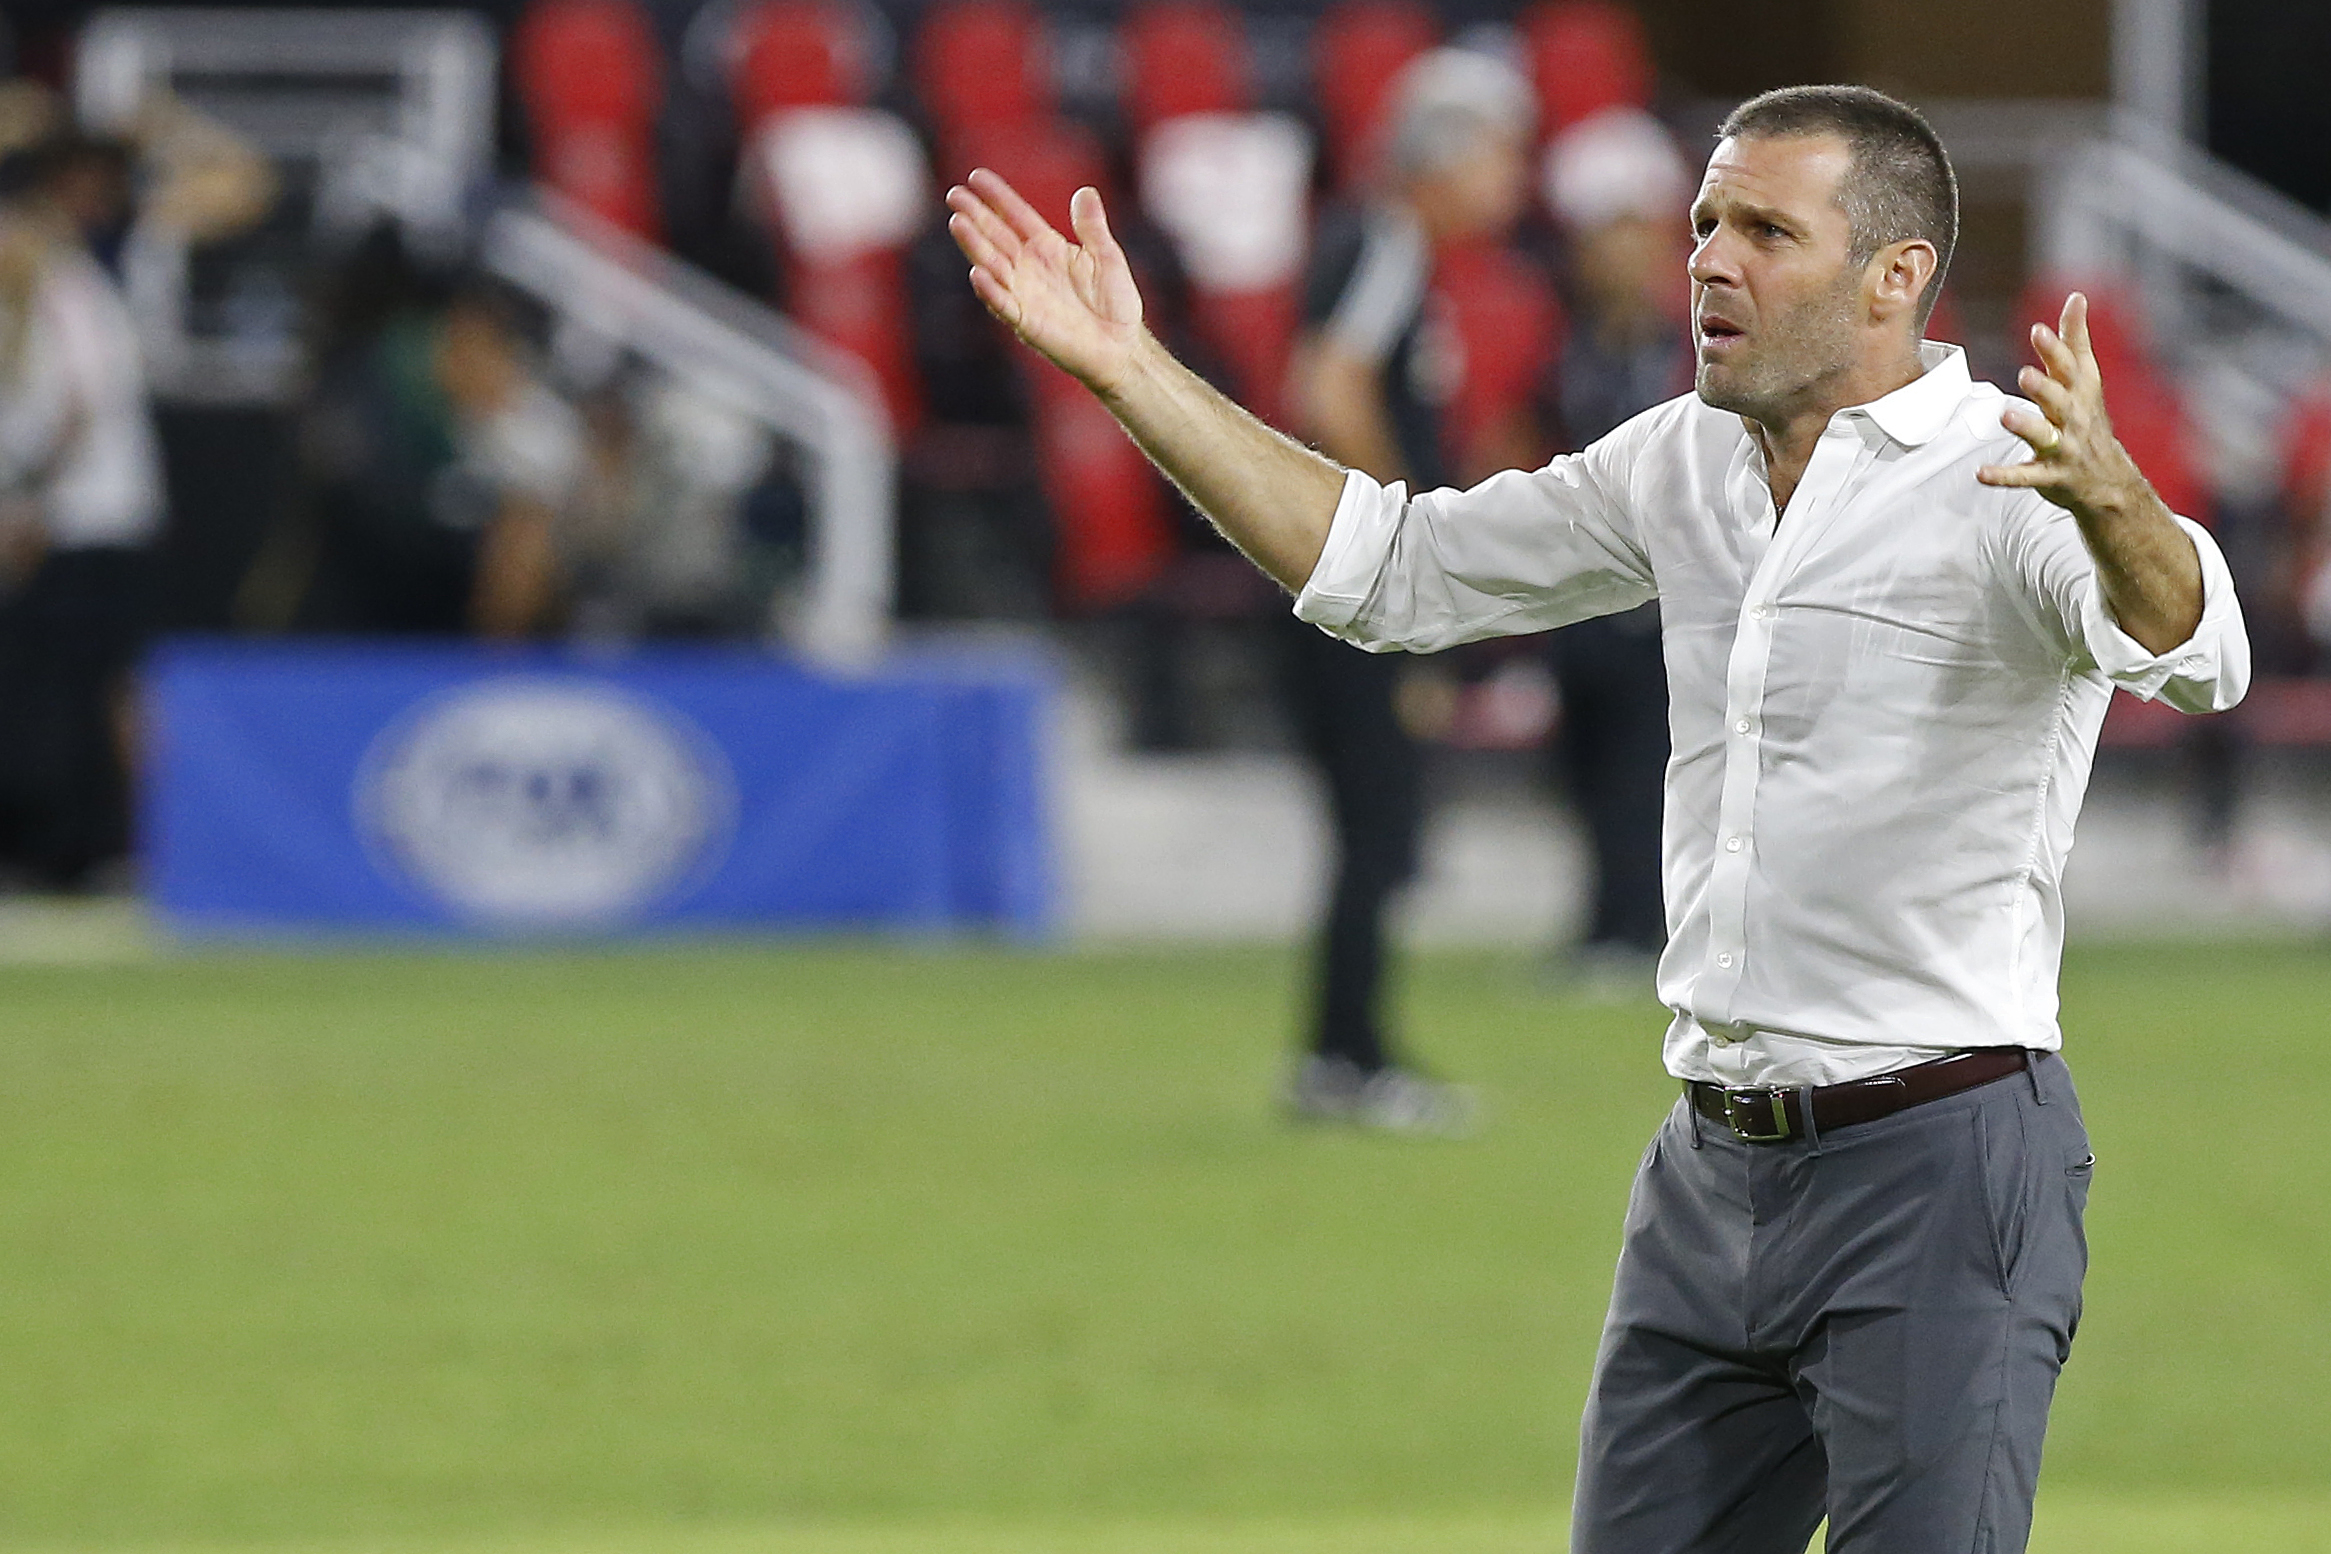 MLS: LA Galaxy at D.C. United